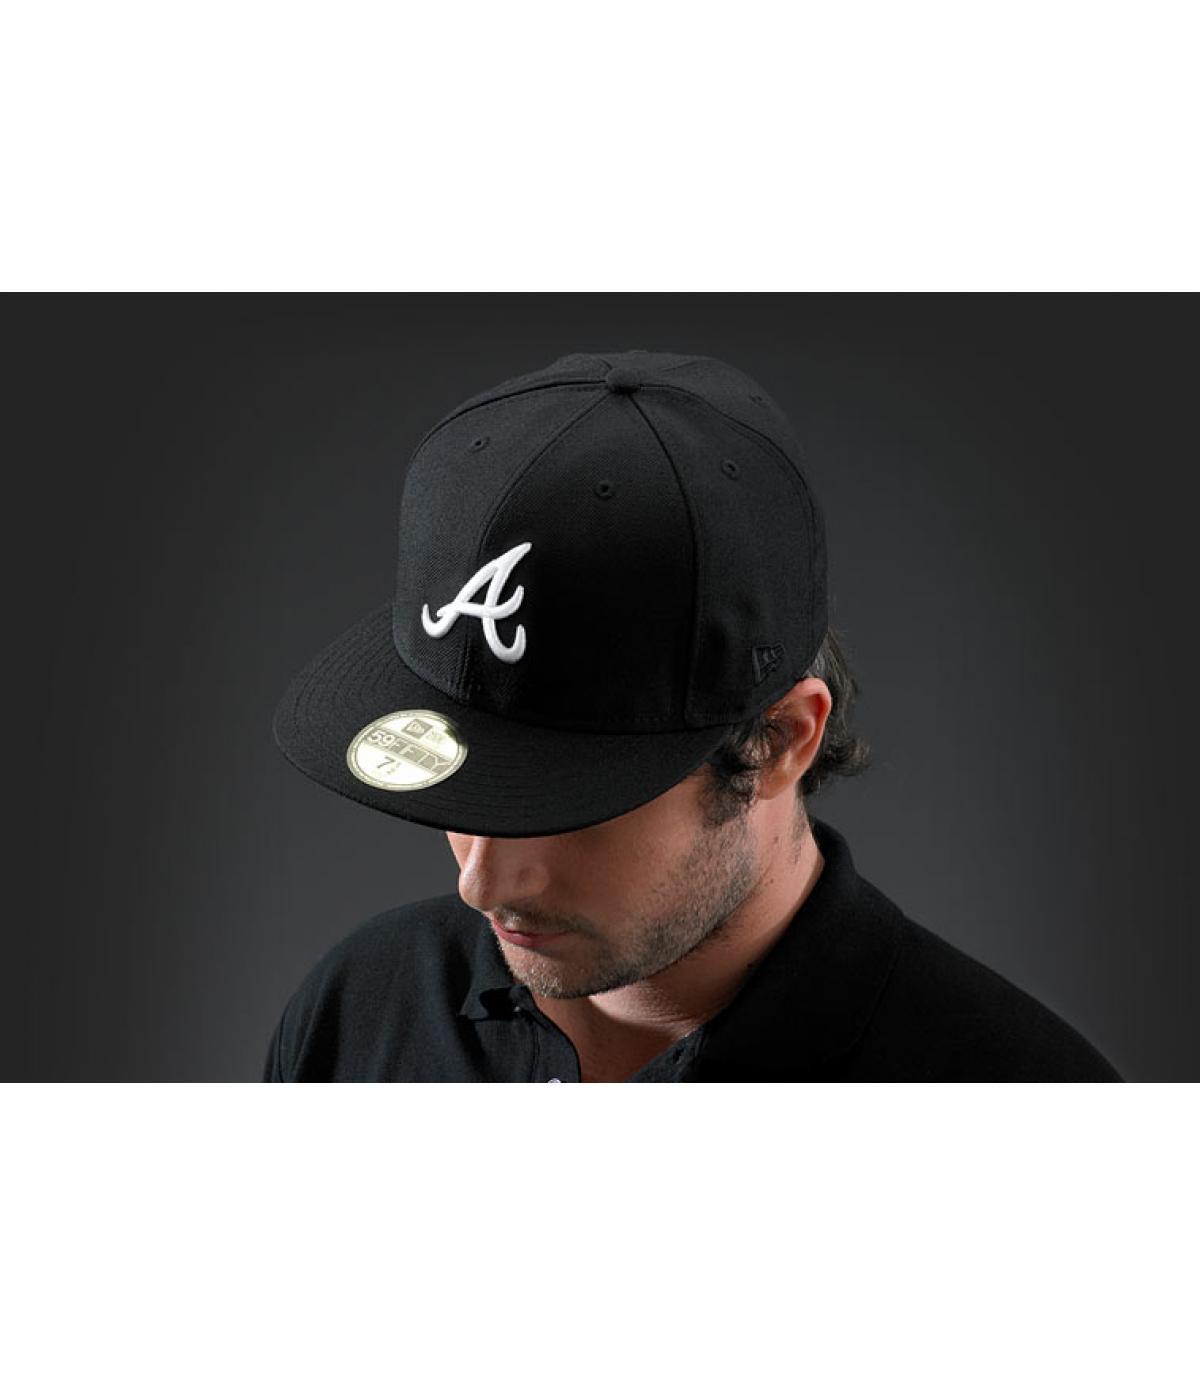 casquette atlanta noir blanche